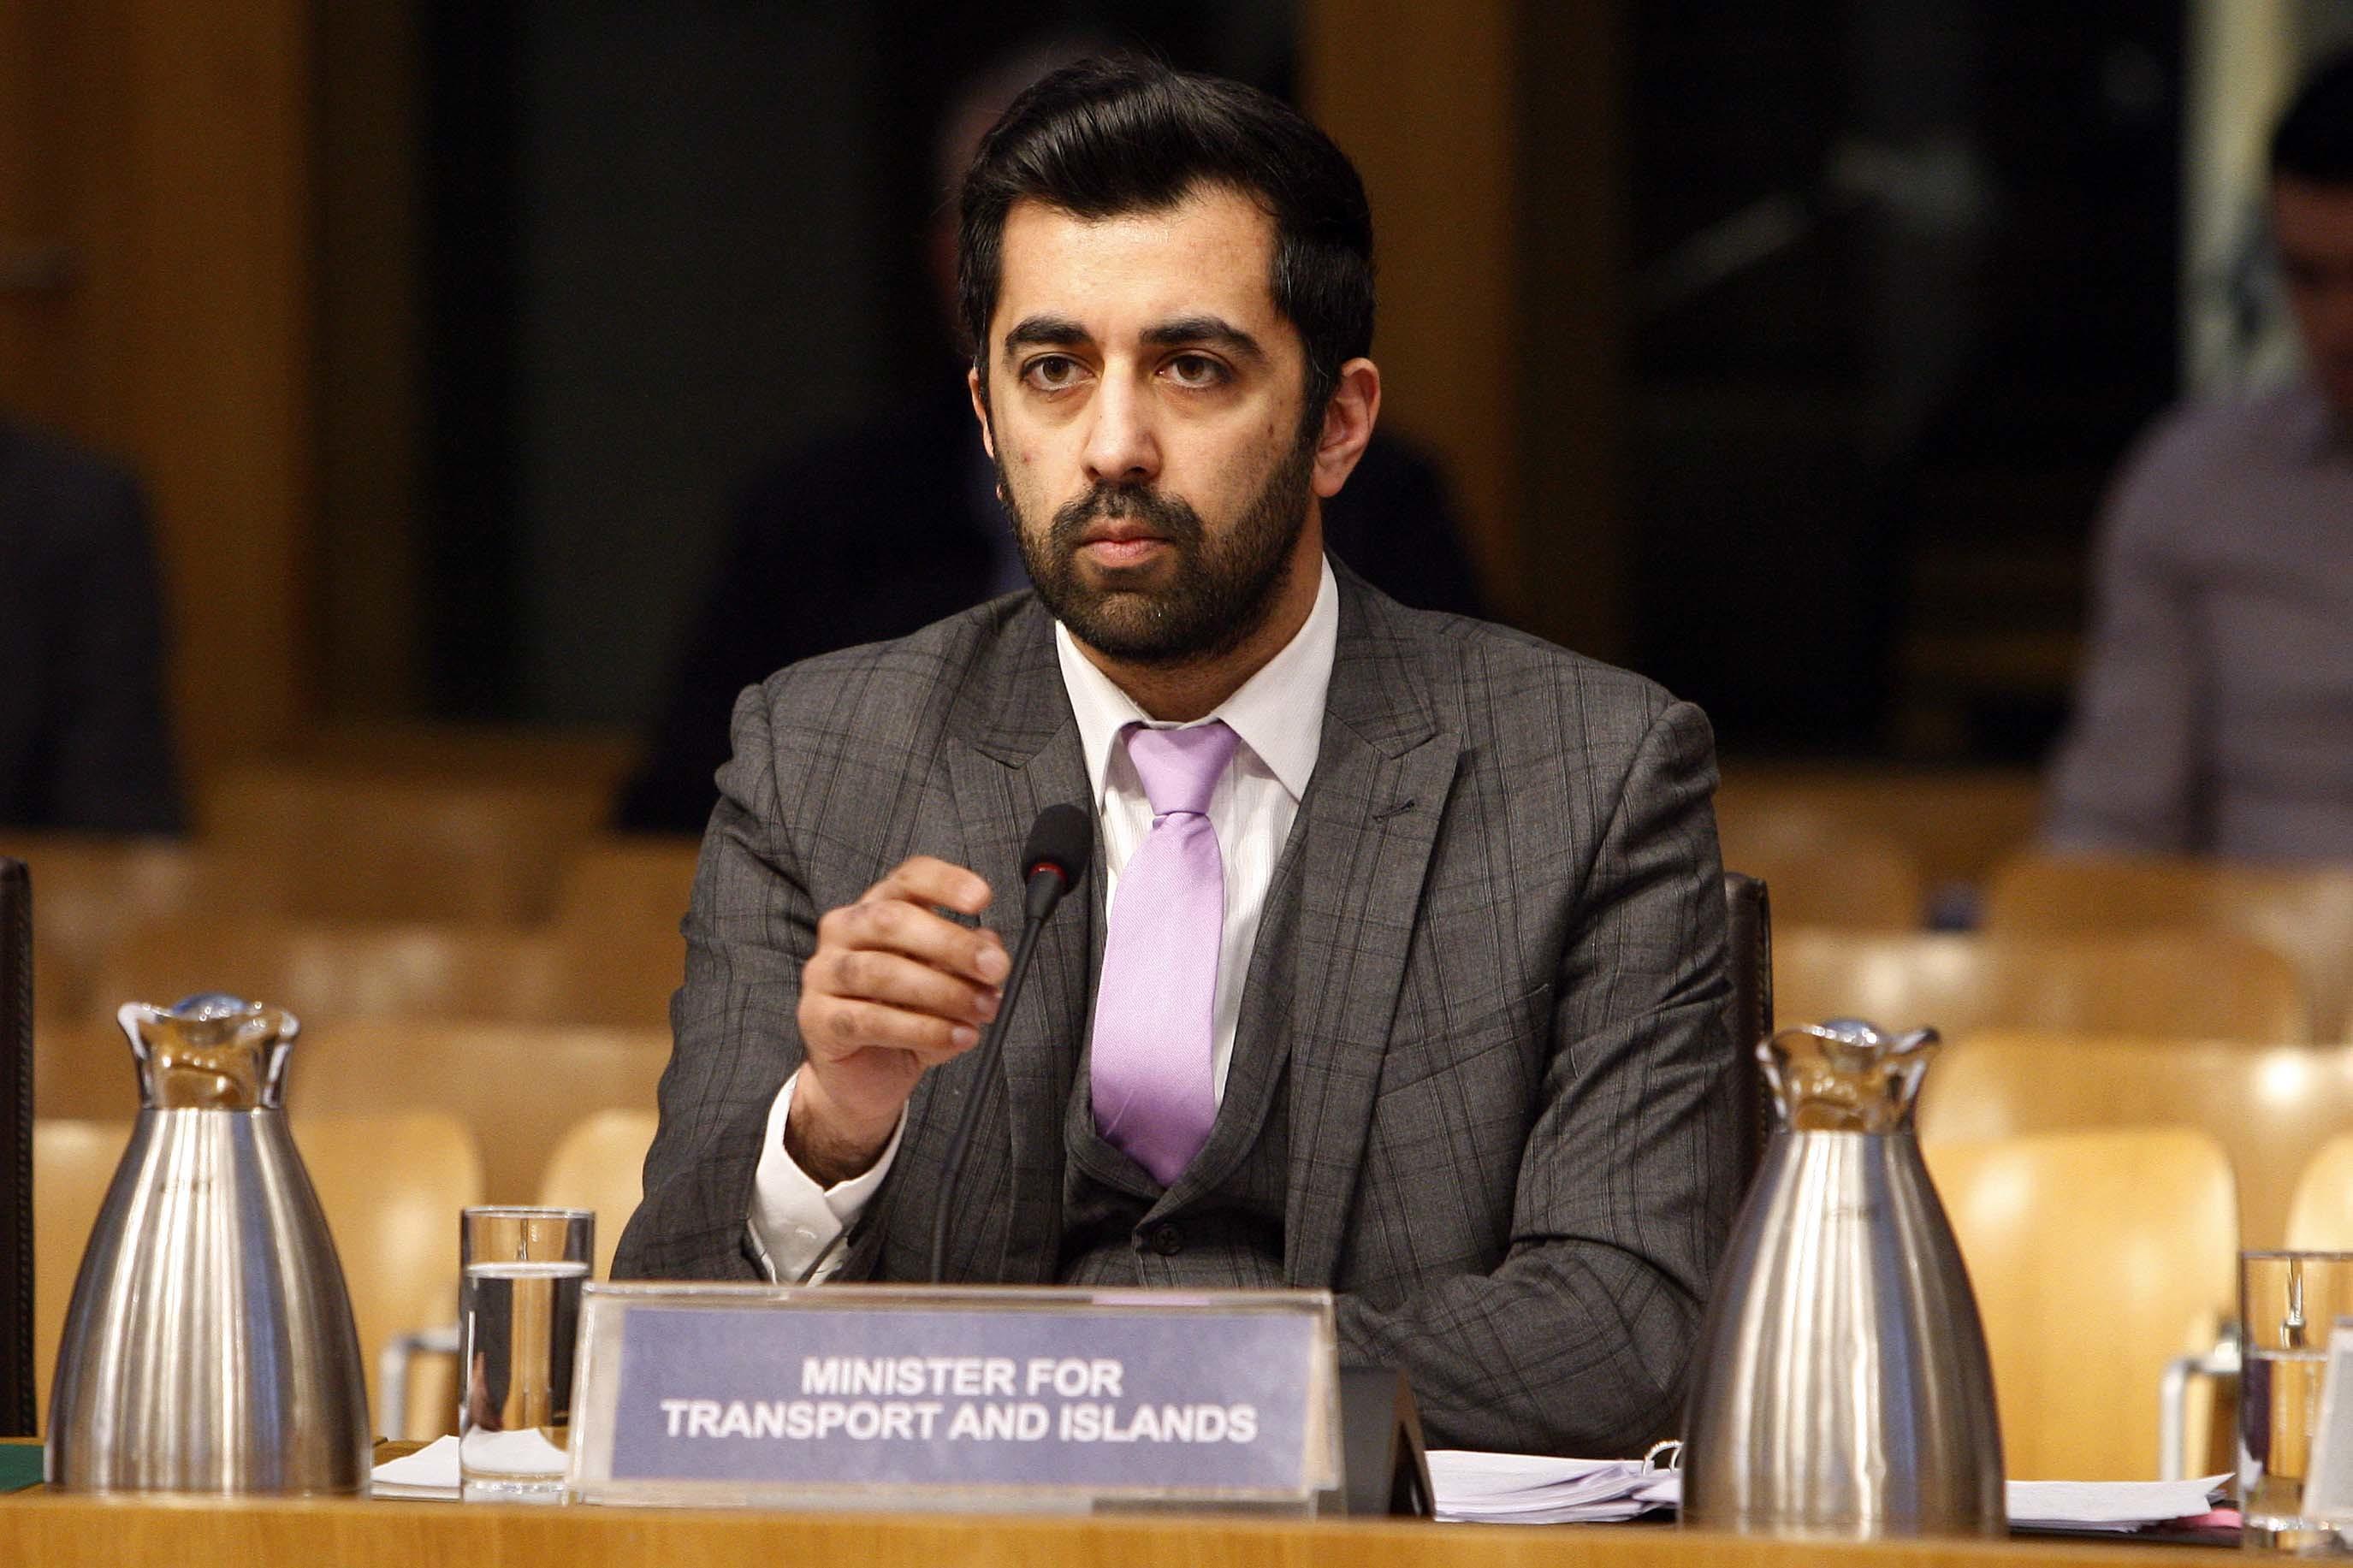 Humza Yousaf (Andrew Cowan/Scottish Parliament)